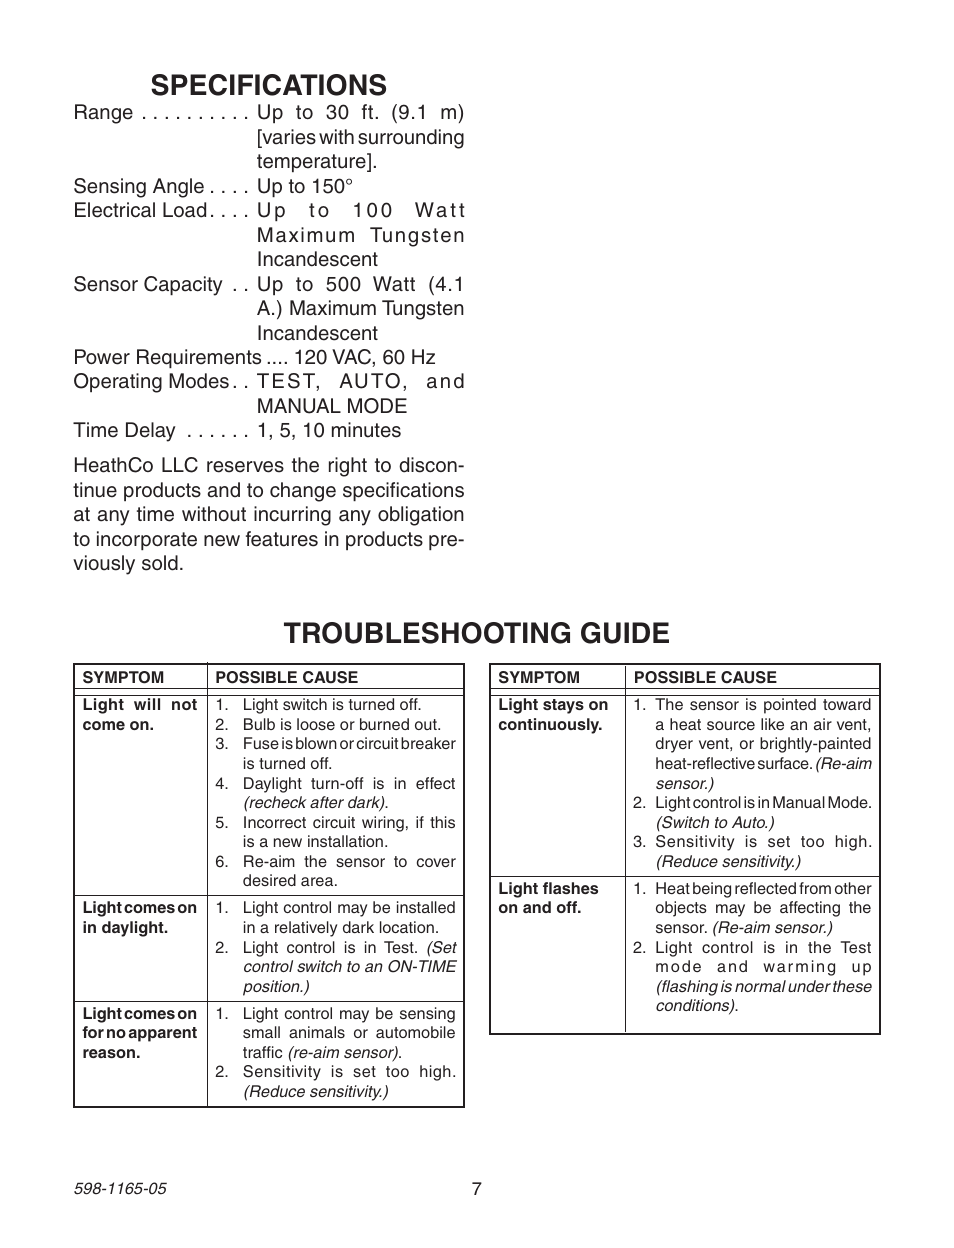 specifications troubleshooting guide heath zenith pf 4160 ab user rh manualsdir com Heath Zenith Support Heath Zenith Wireless Command